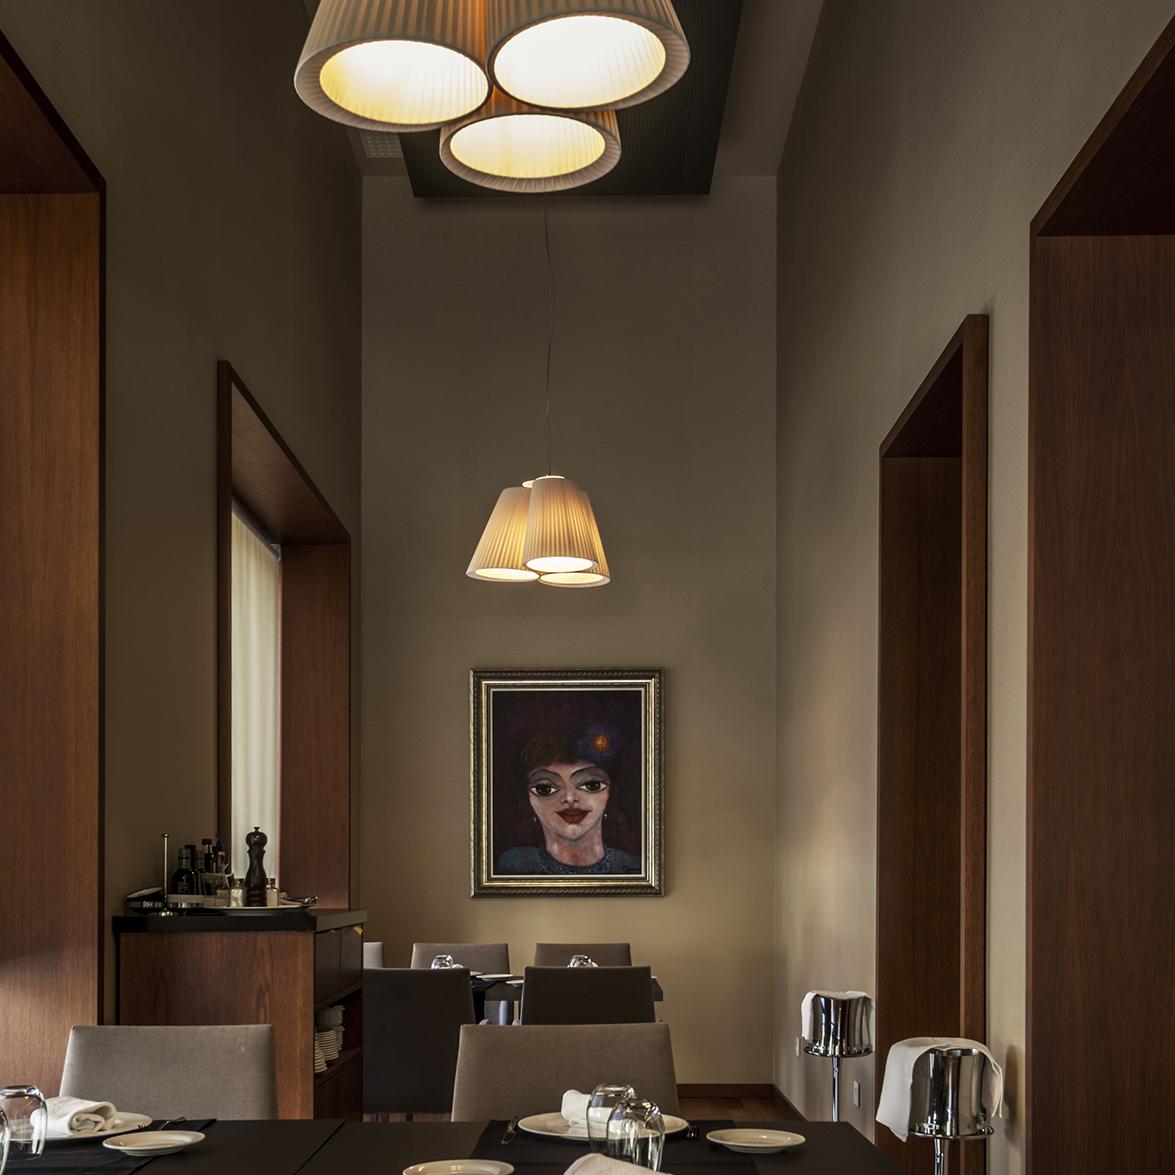 florinda-3-sospensione-by-modoluce-juan-lax-restaurant-in-murcia-1